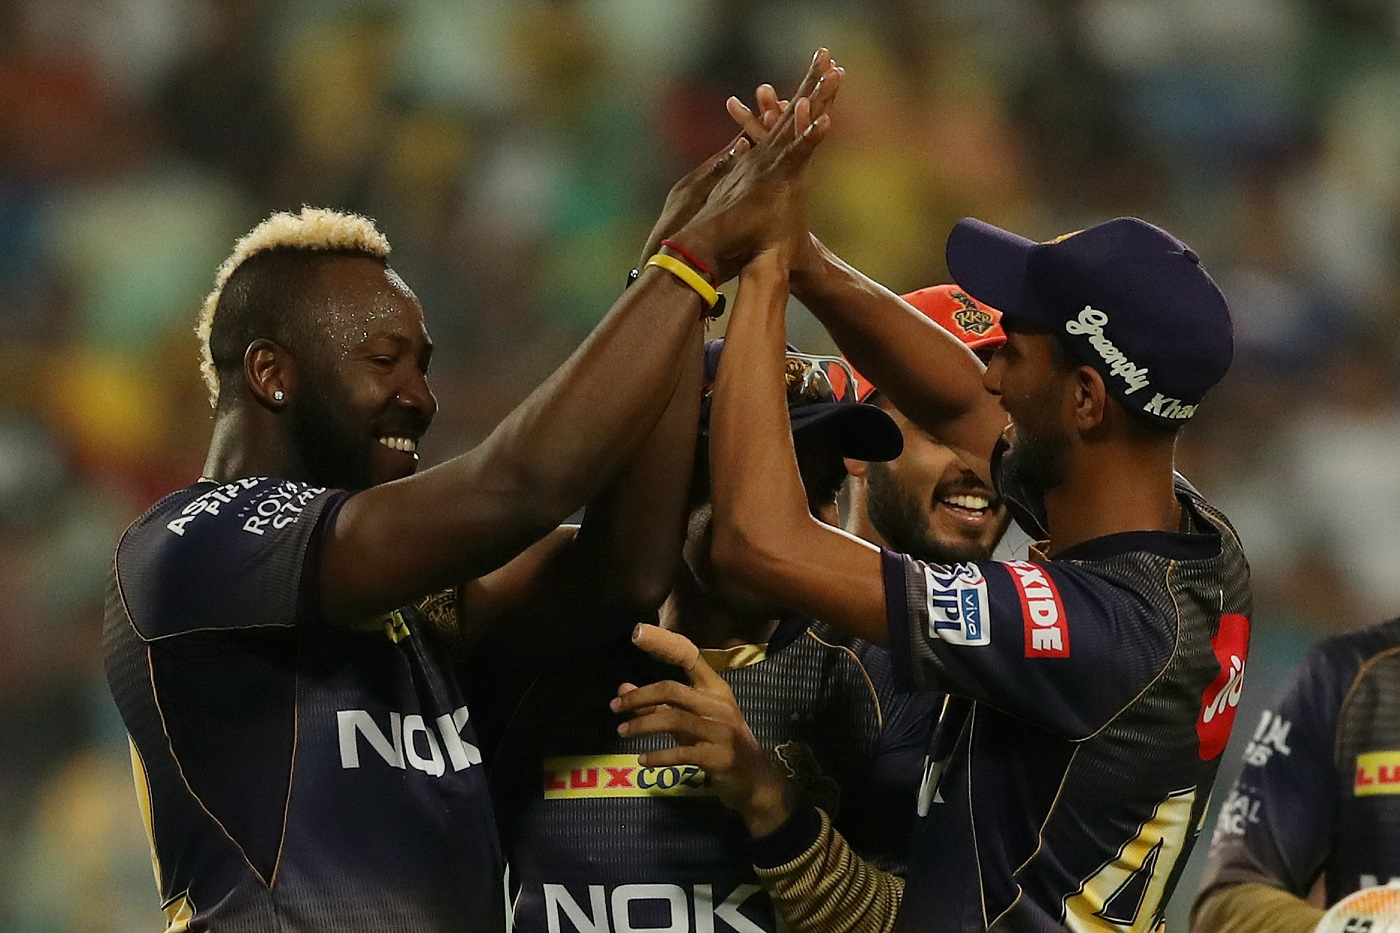 IPL 2019: Match 6, KKR vs KXIP - Twitter Rejoices As Kolkata Knight Riders Script Consecutive Wins 1